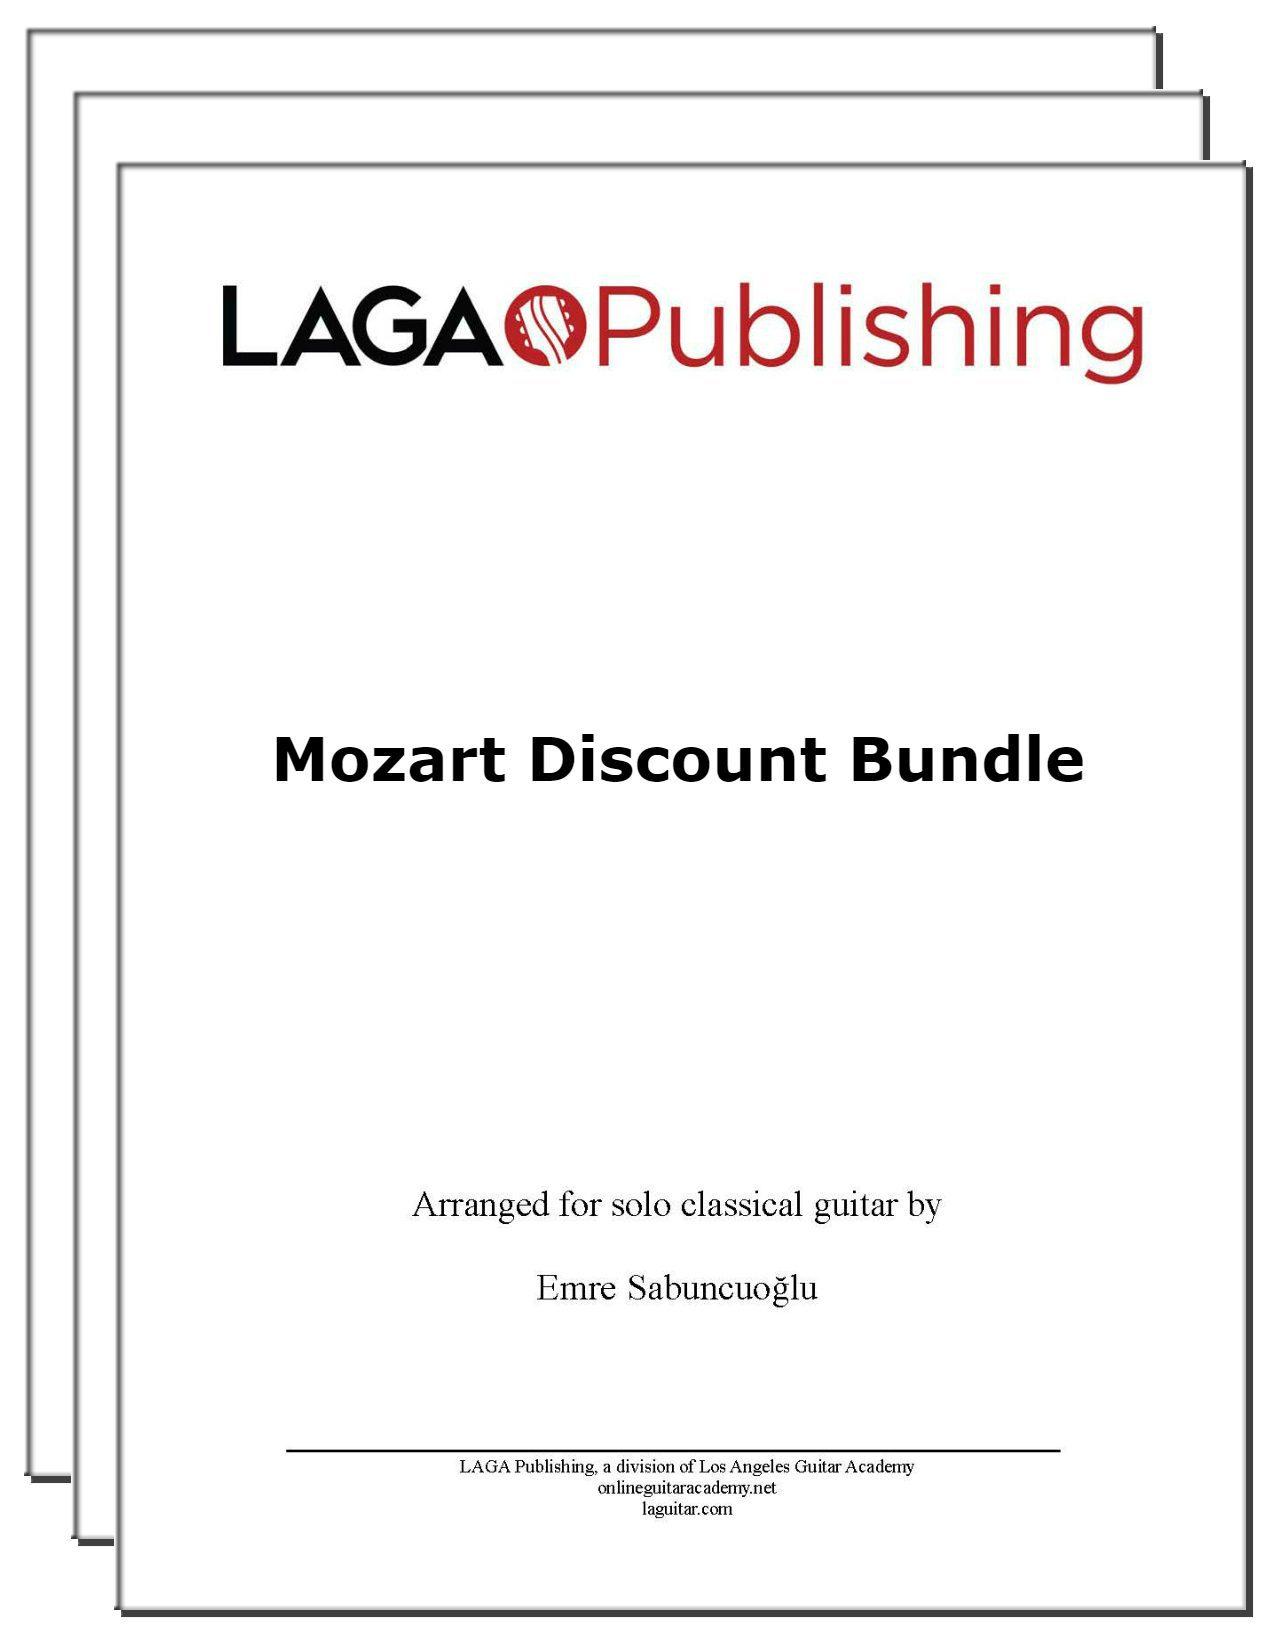 LAGA-Publishing-mozart-discount-bundle